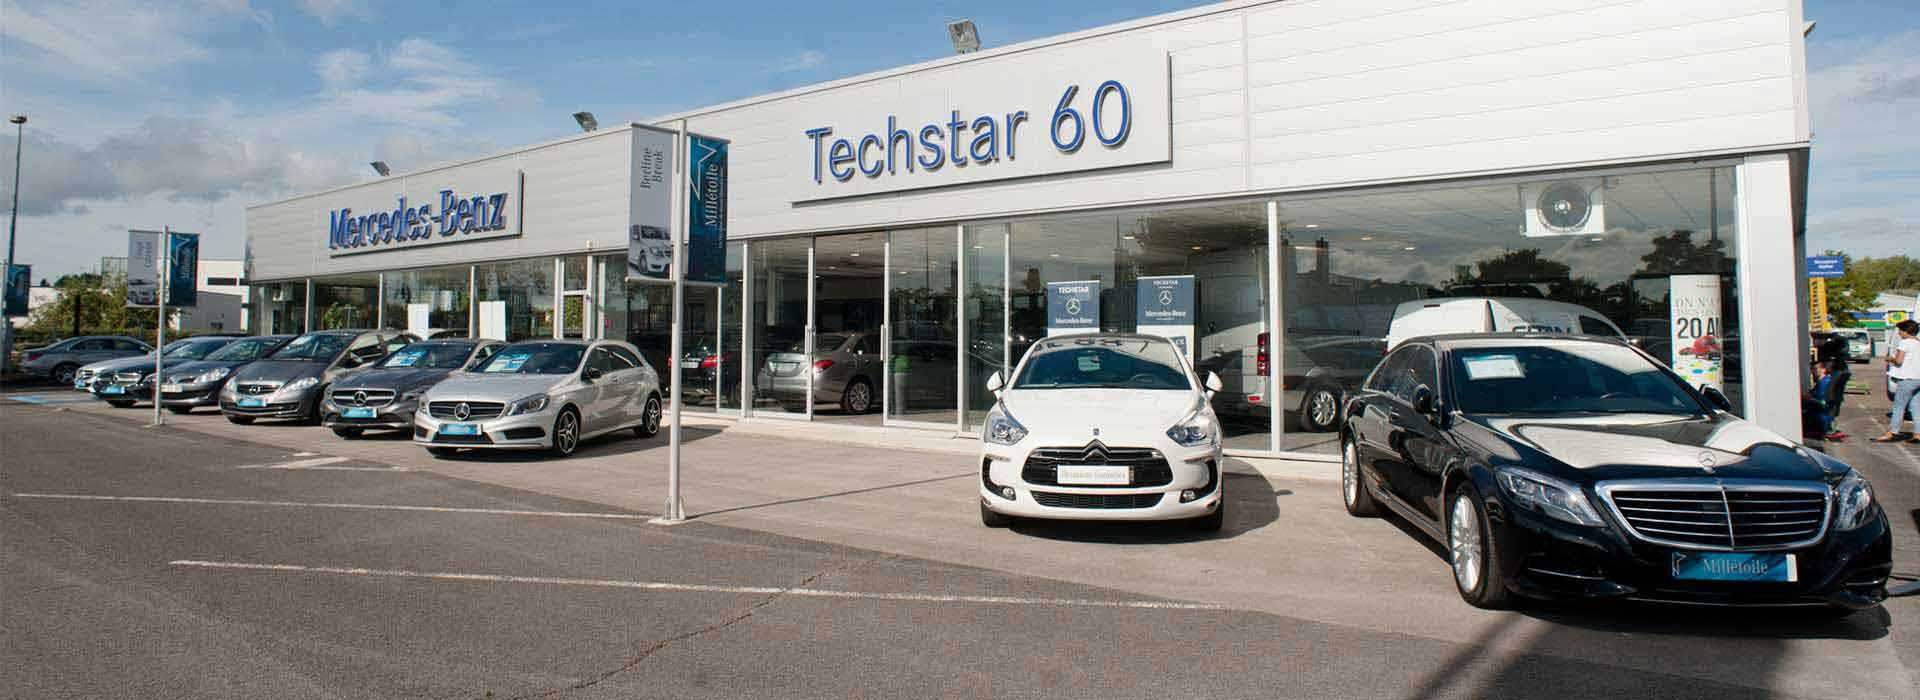 Mercedes benz compiegne concessionnaire garage oise 60 - Garage citroen compiegne ...